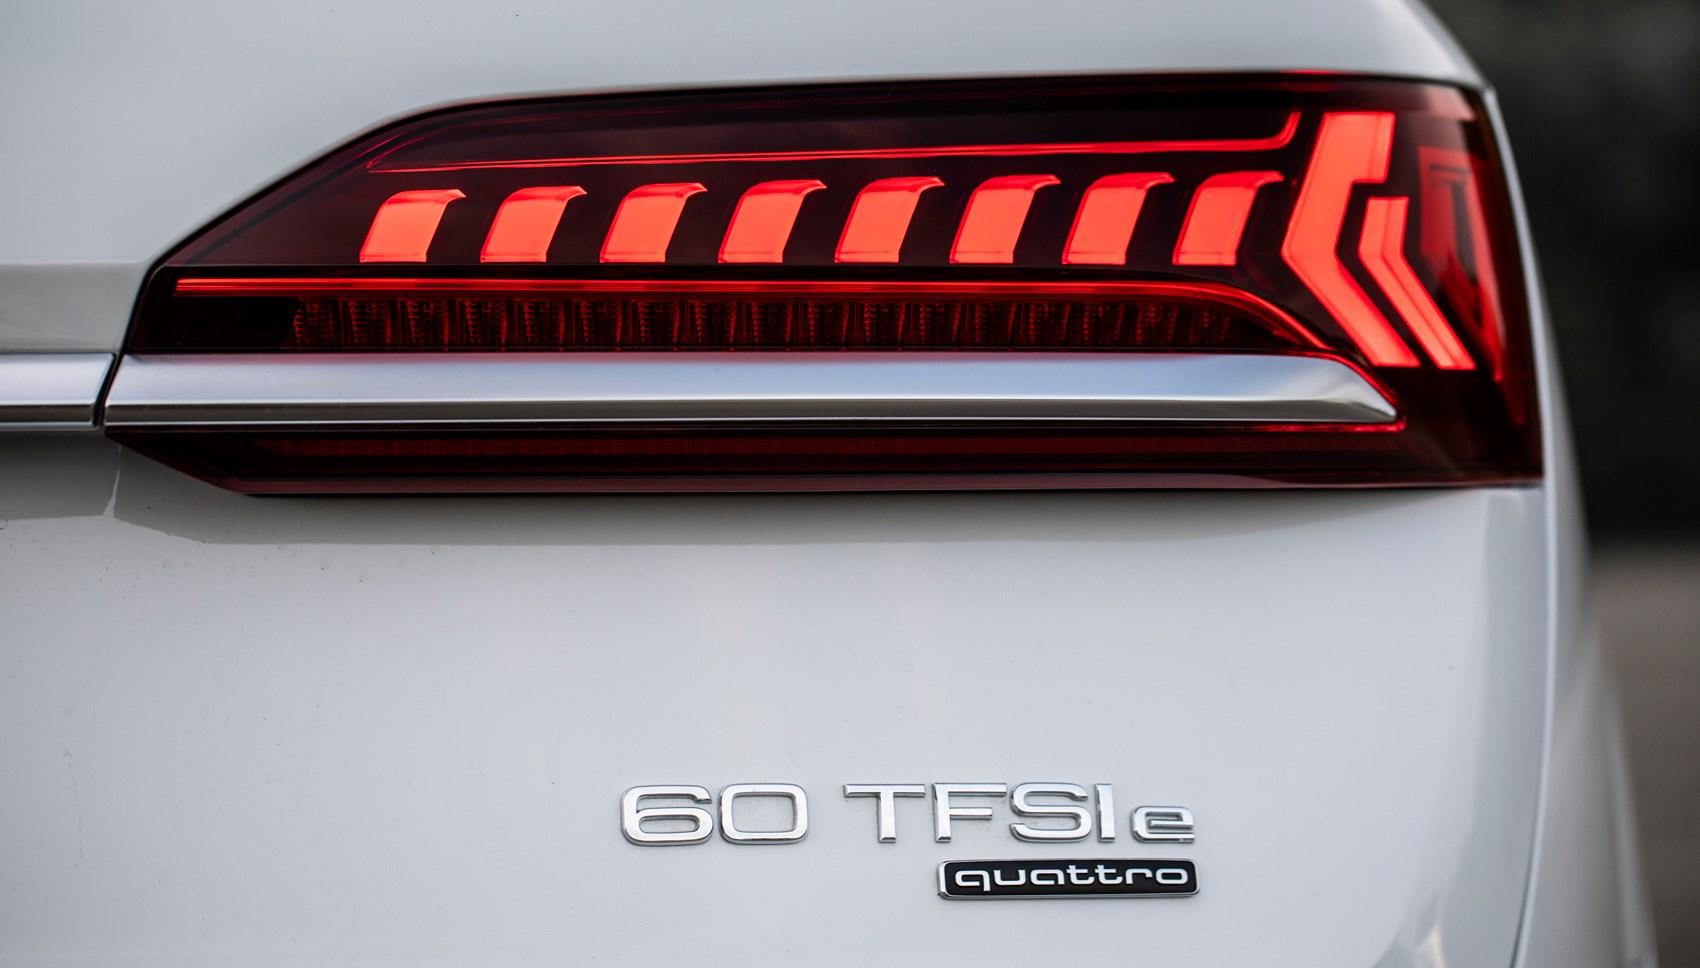 Audi Q7 hybrid badge